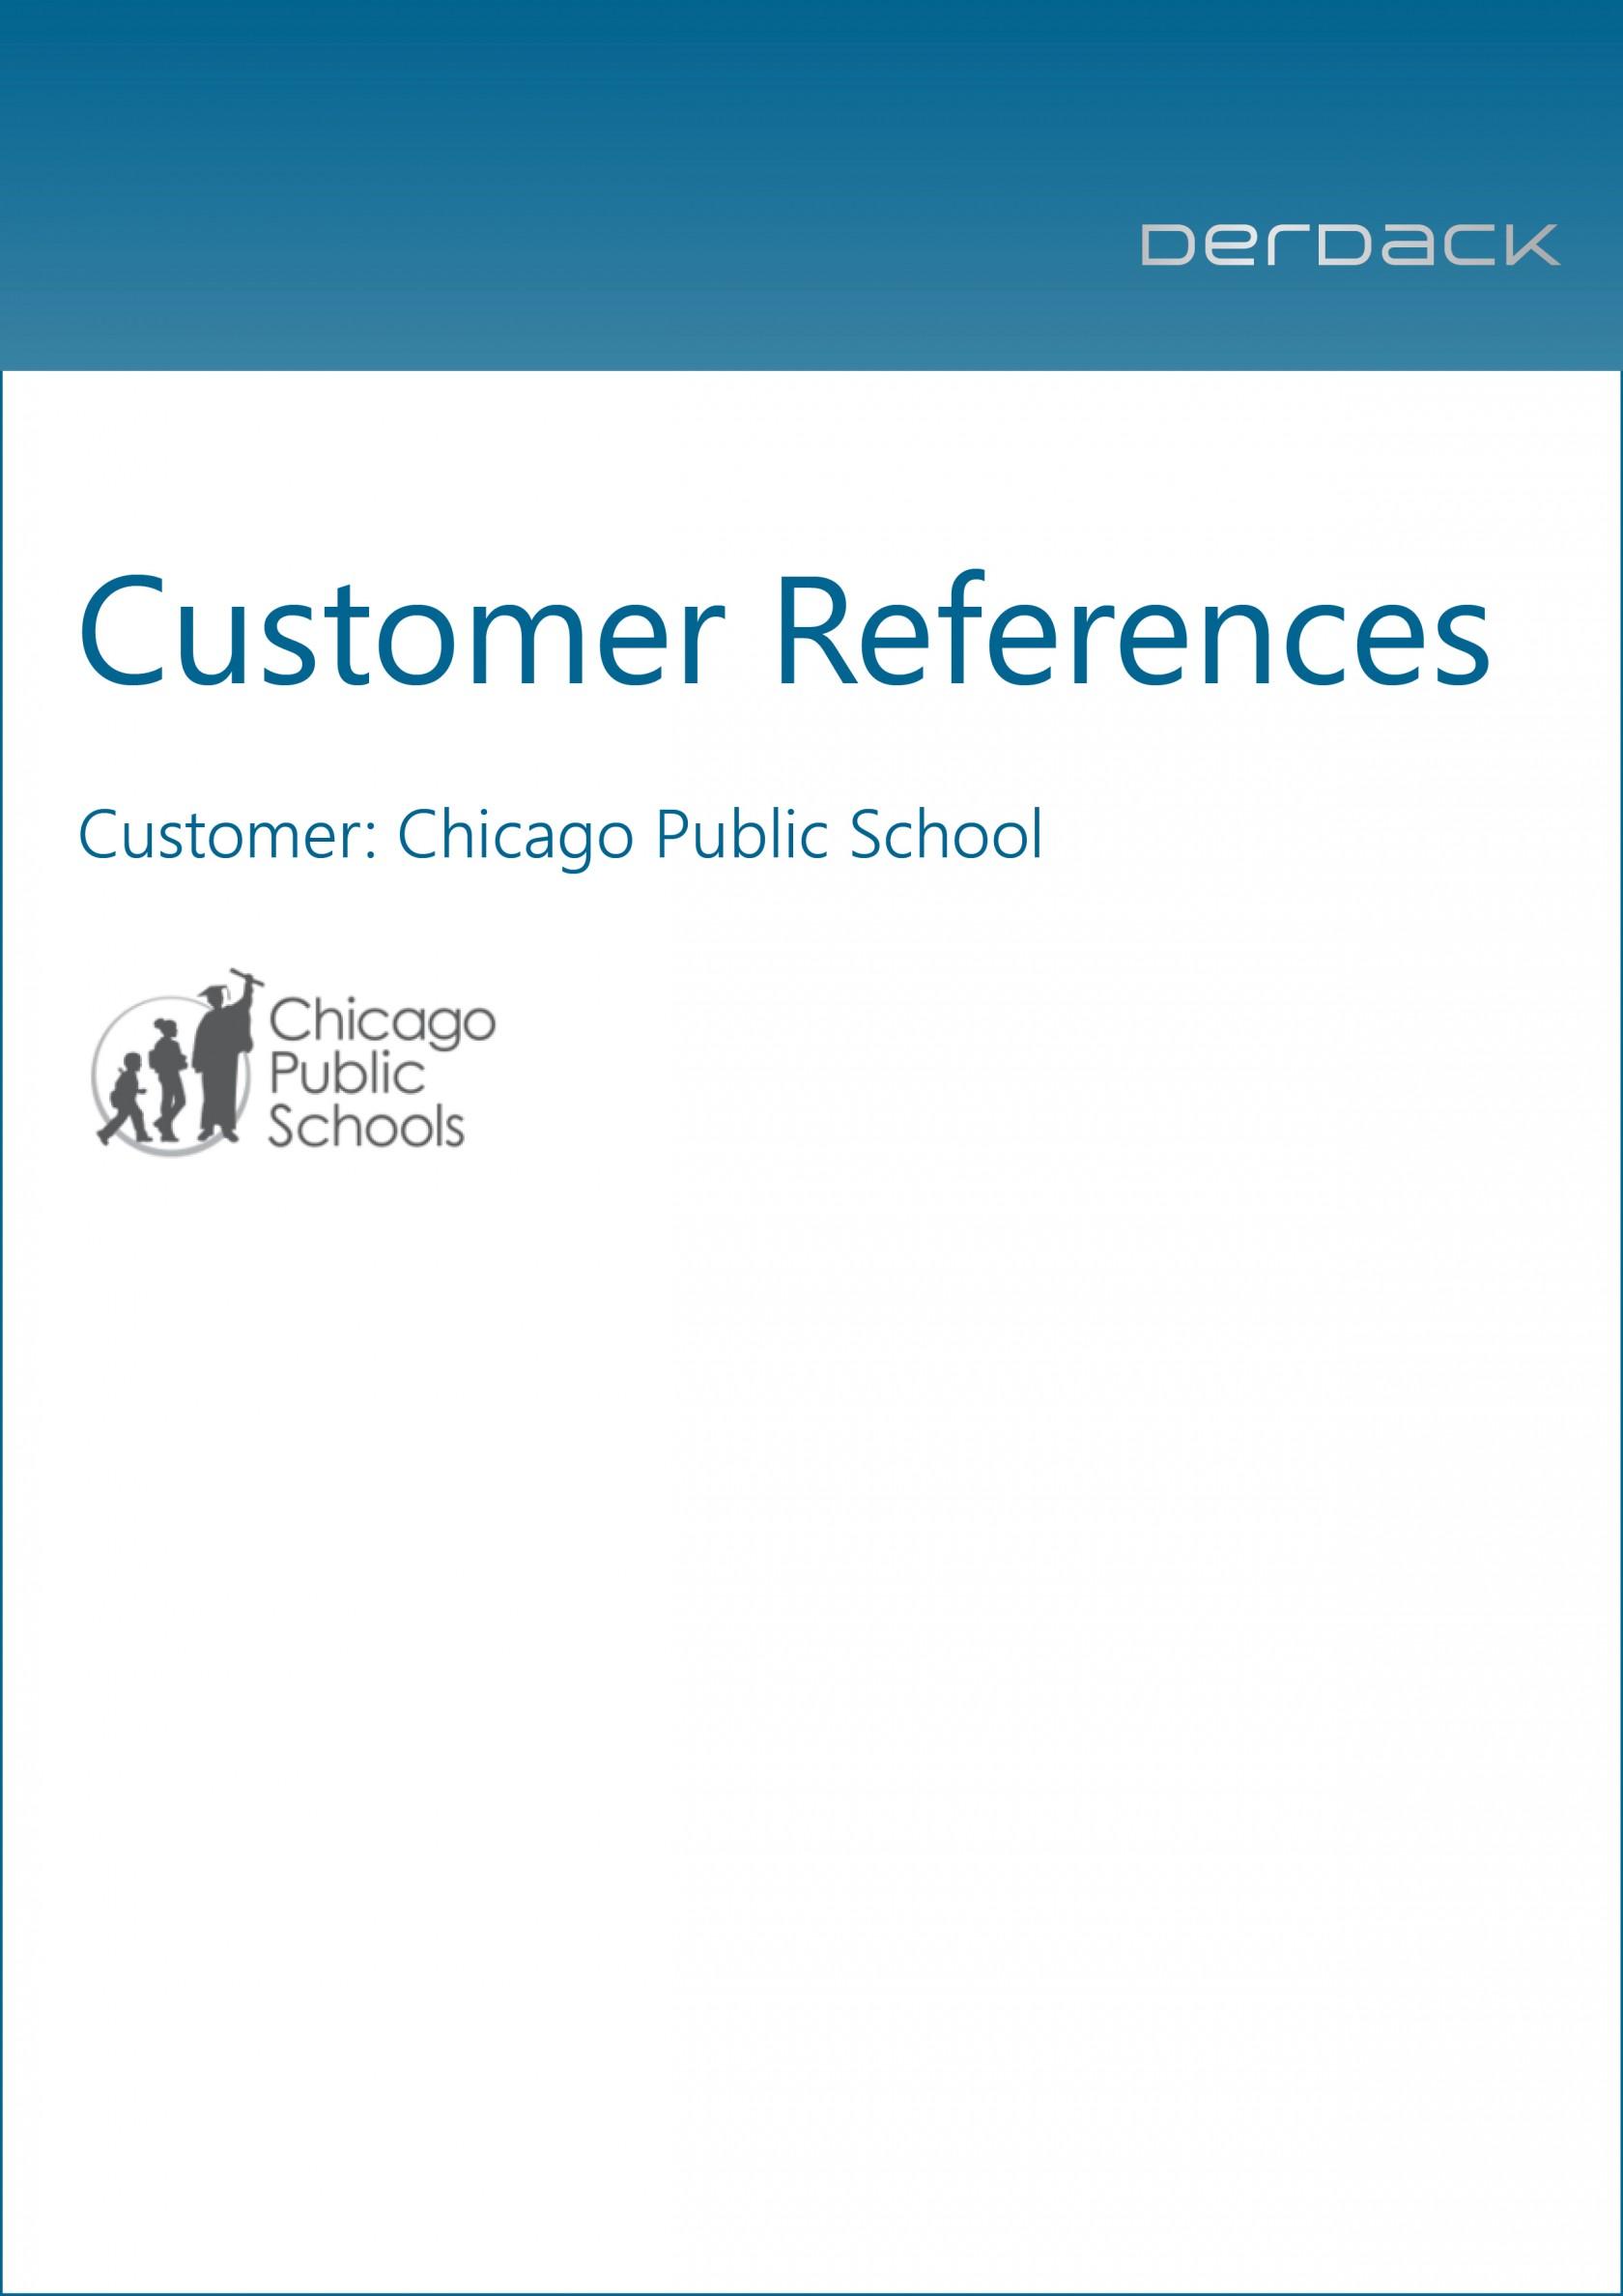 Derdack Customer Reference